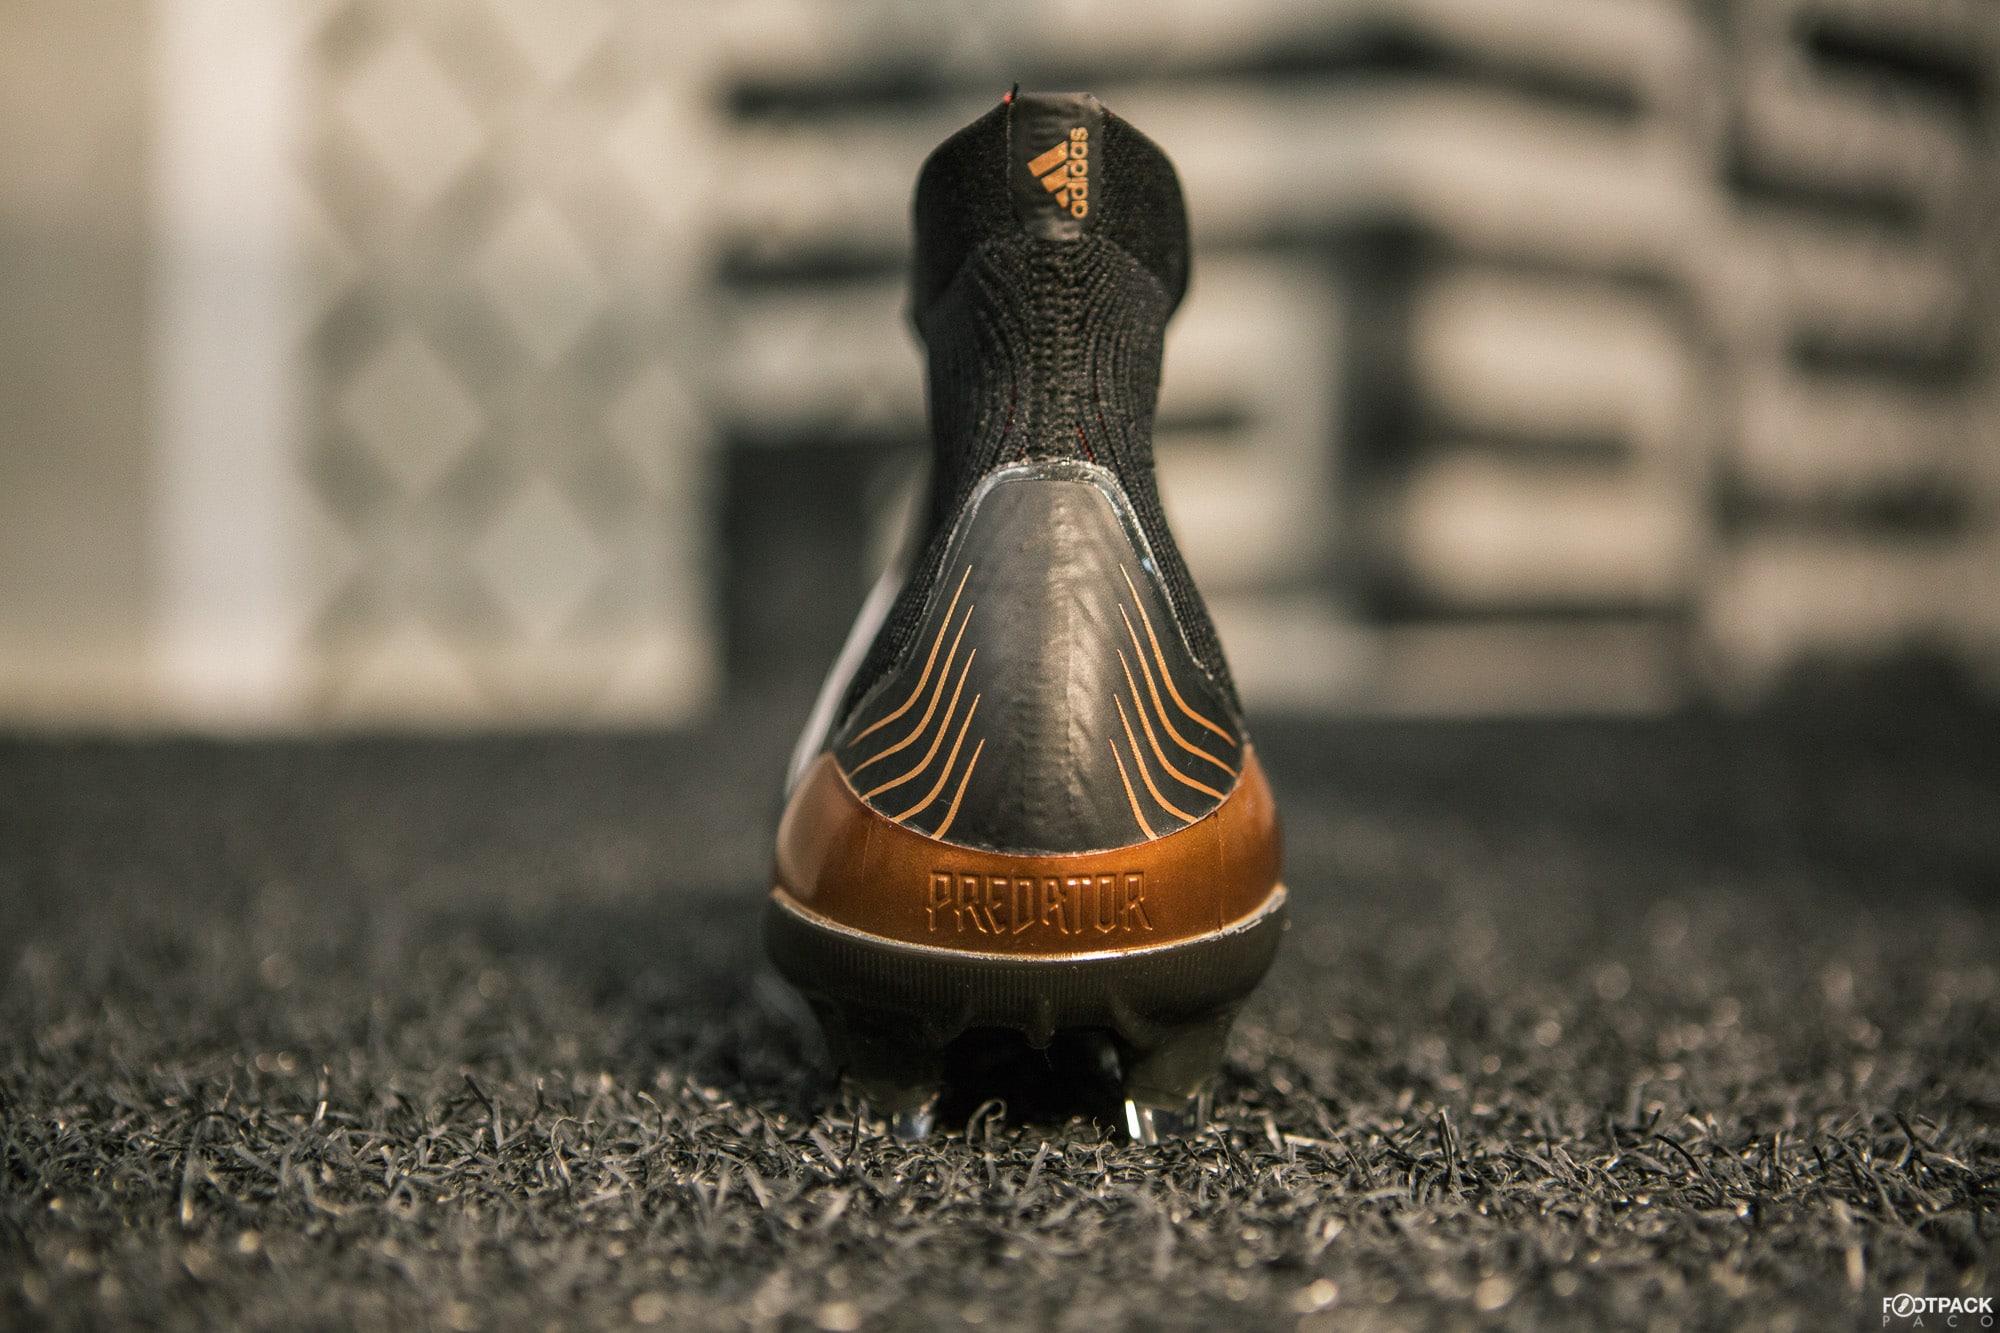 Tout sur la gamme Predator 18 d'adidas